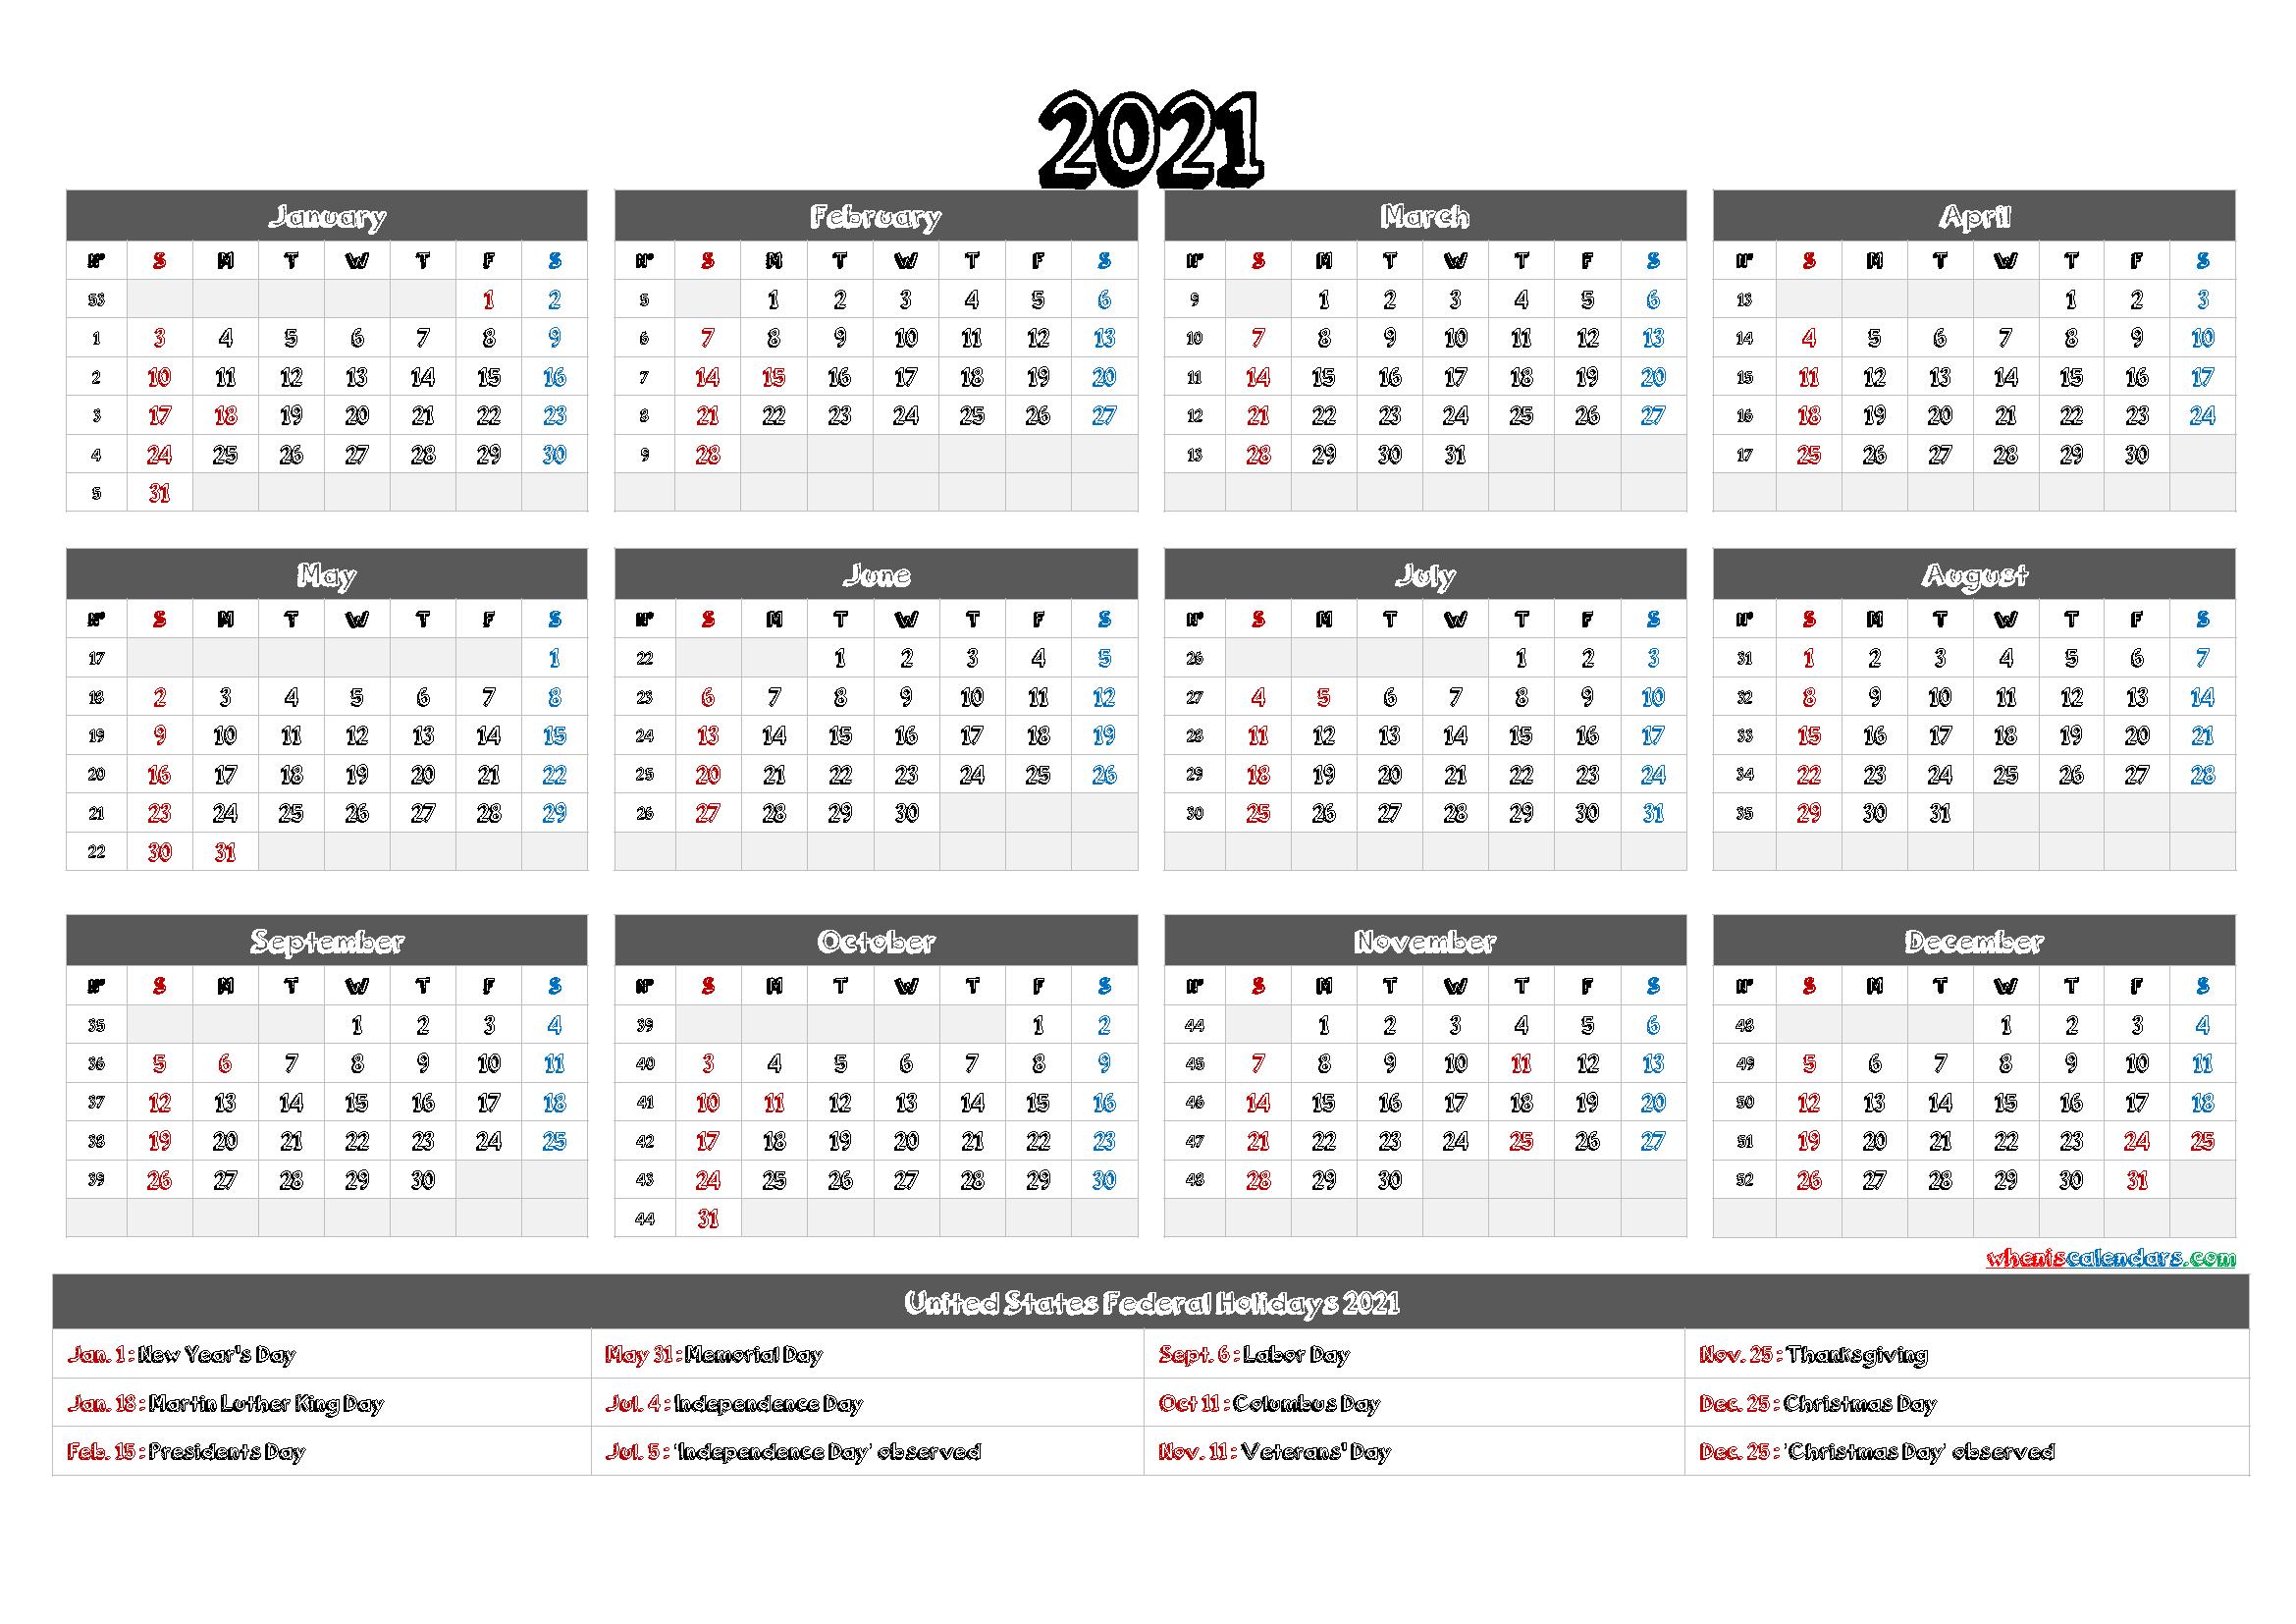 2021 Calendar Printable Pdf - 12 Templates - Free 2020 And